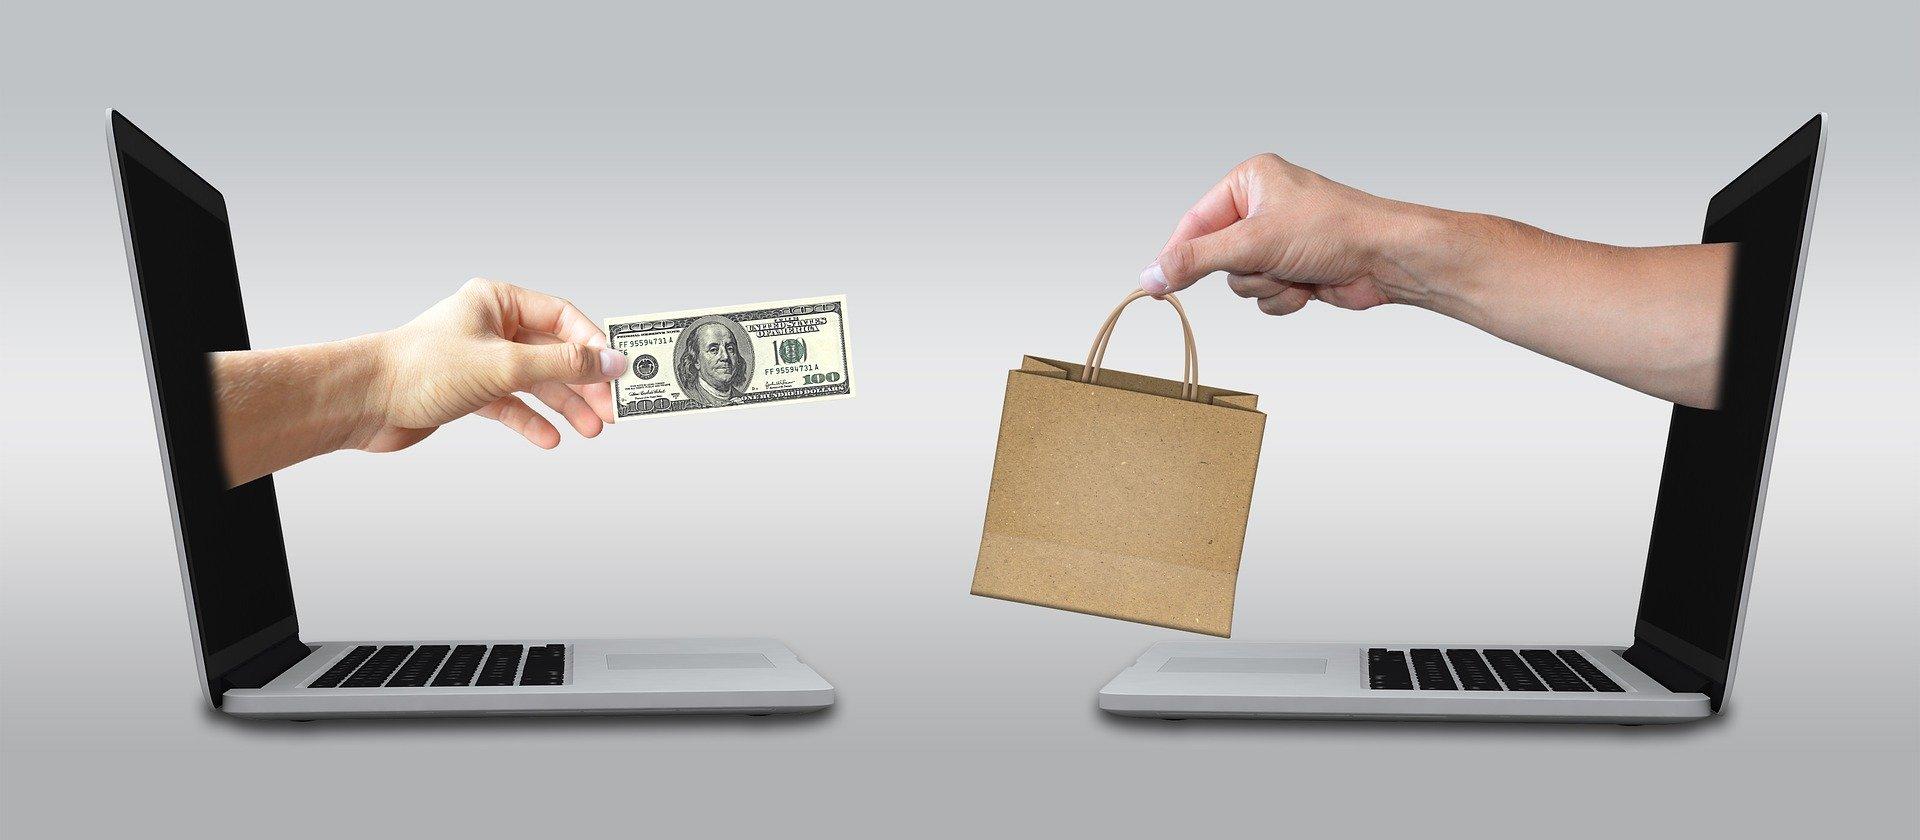 Como vender comida online